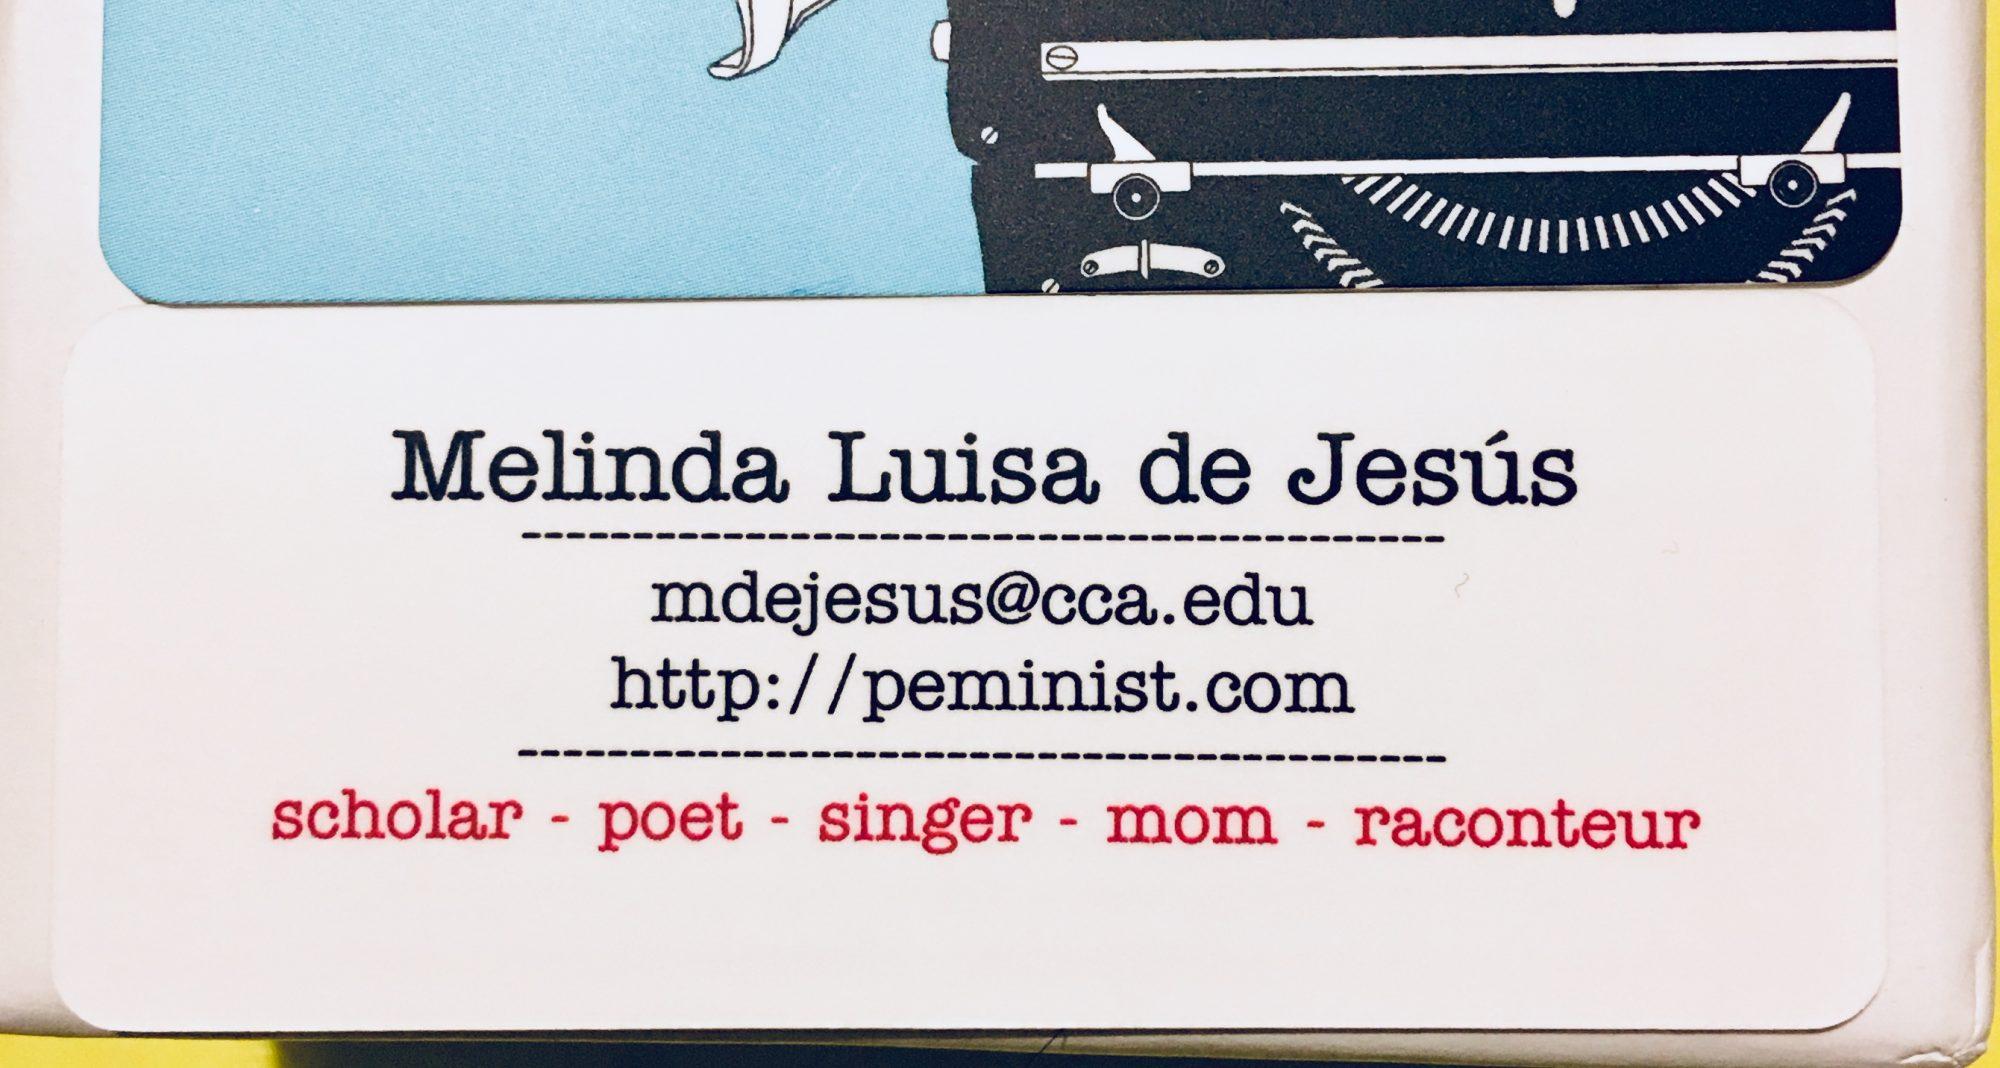 Melinda Luisa de Jesús